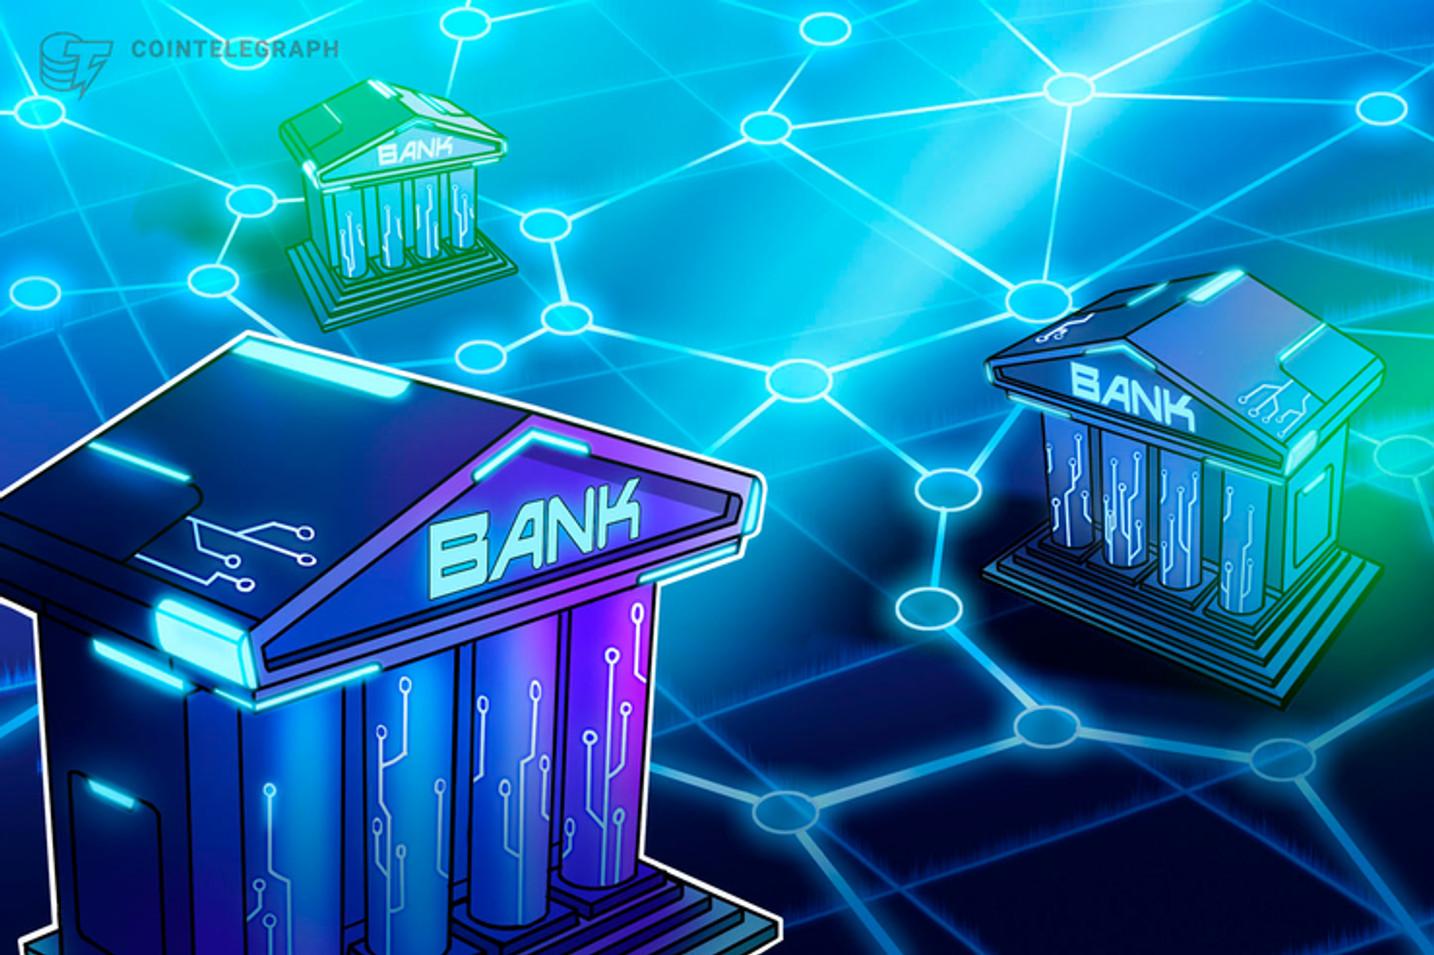 Fintechs e empresas de Bitcoin e criptomoedas poderão usar caixas da rede Banco24horas no Brasil